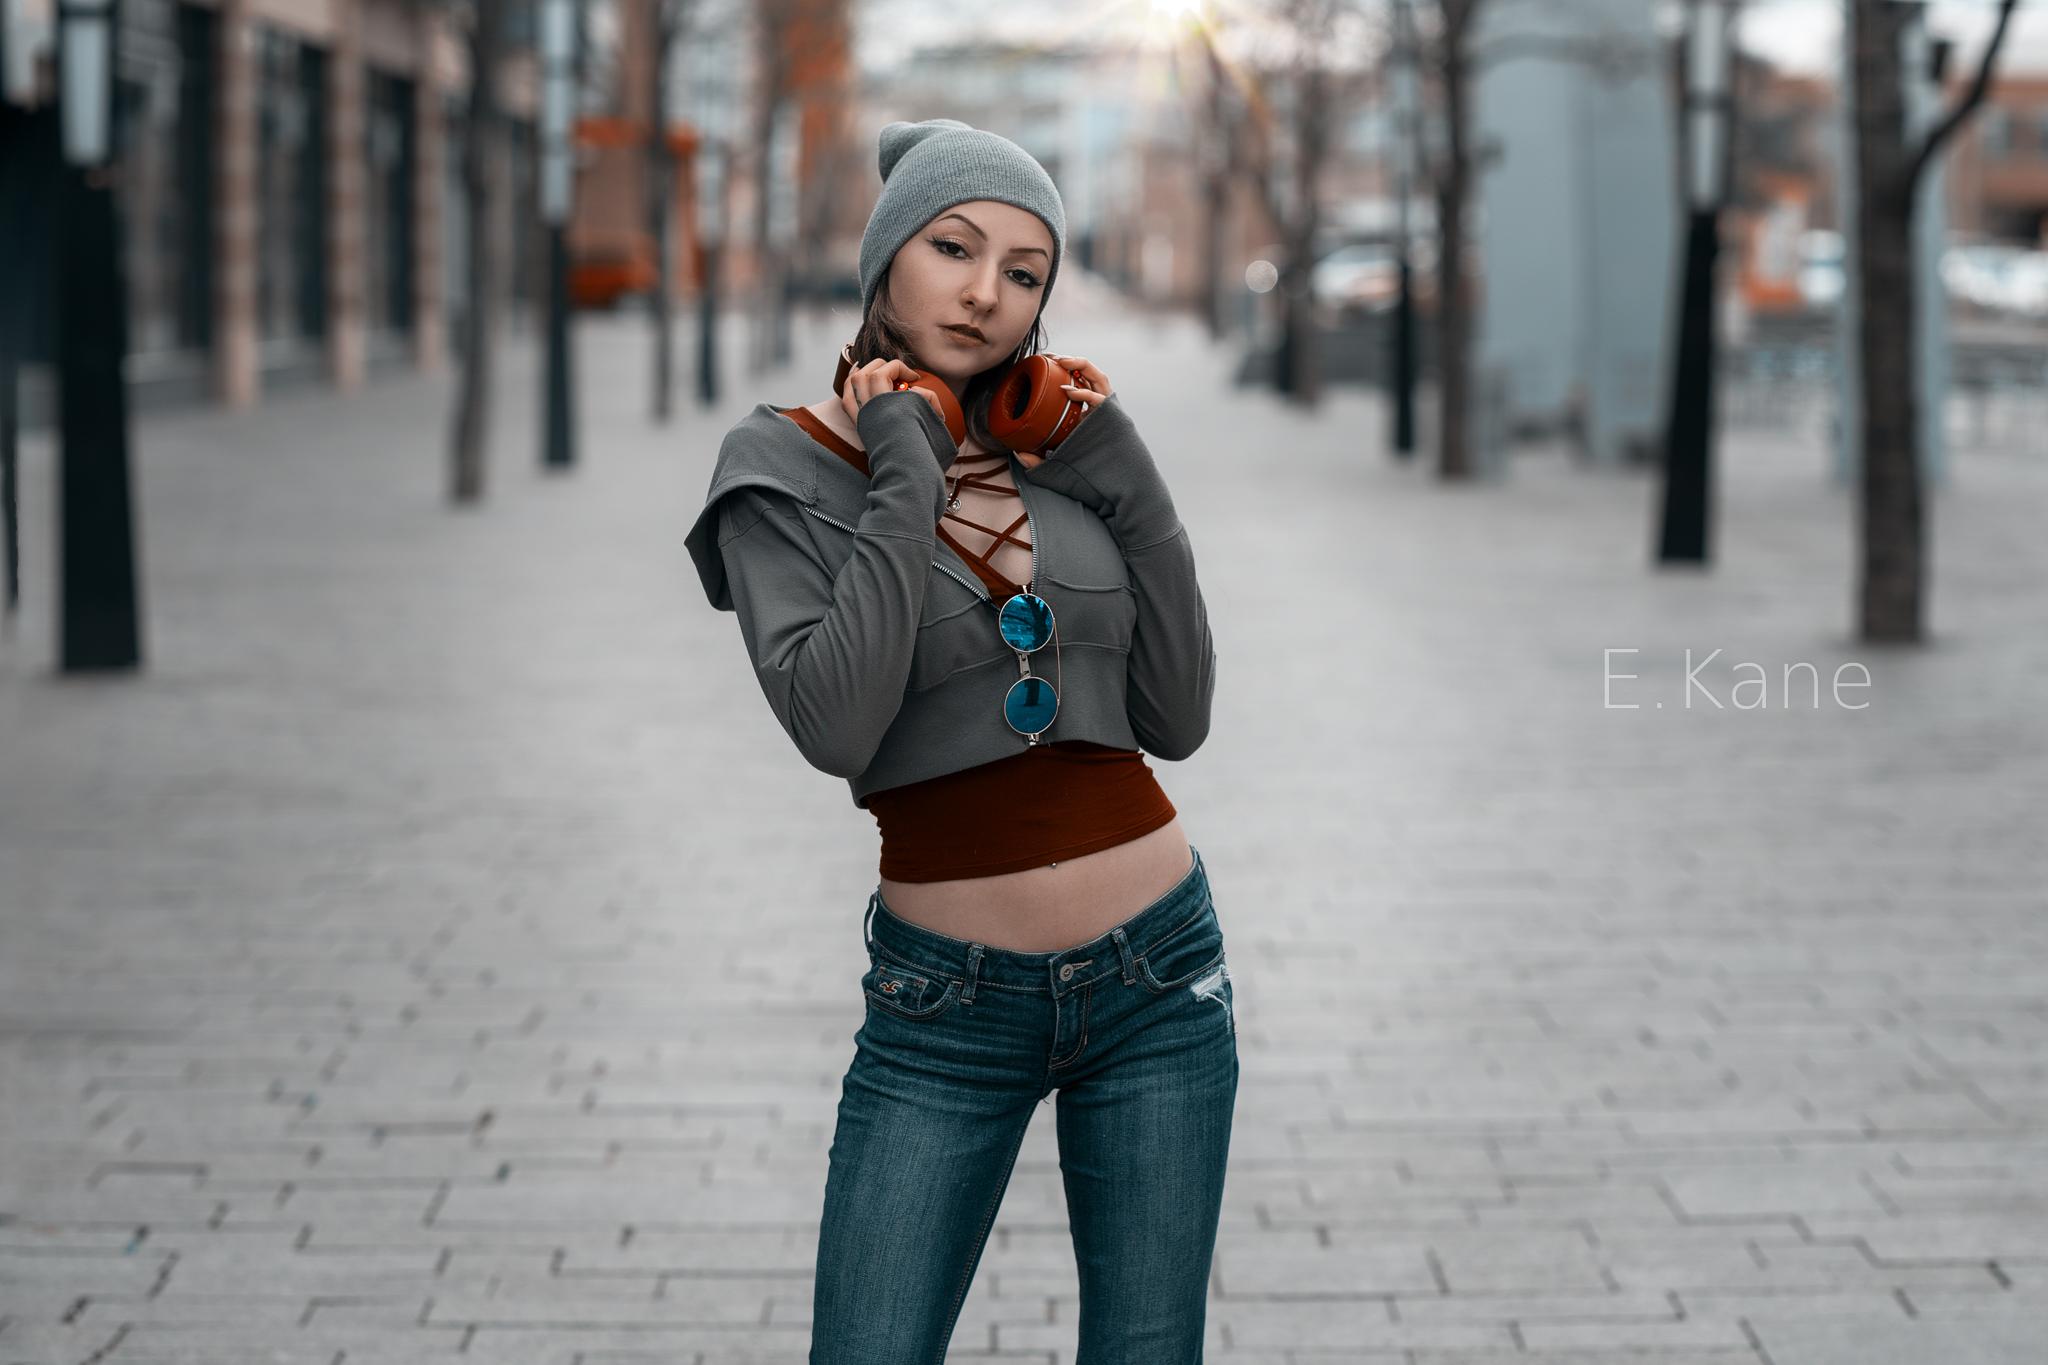 portrait-photography-fort collins-colorado-evan kane